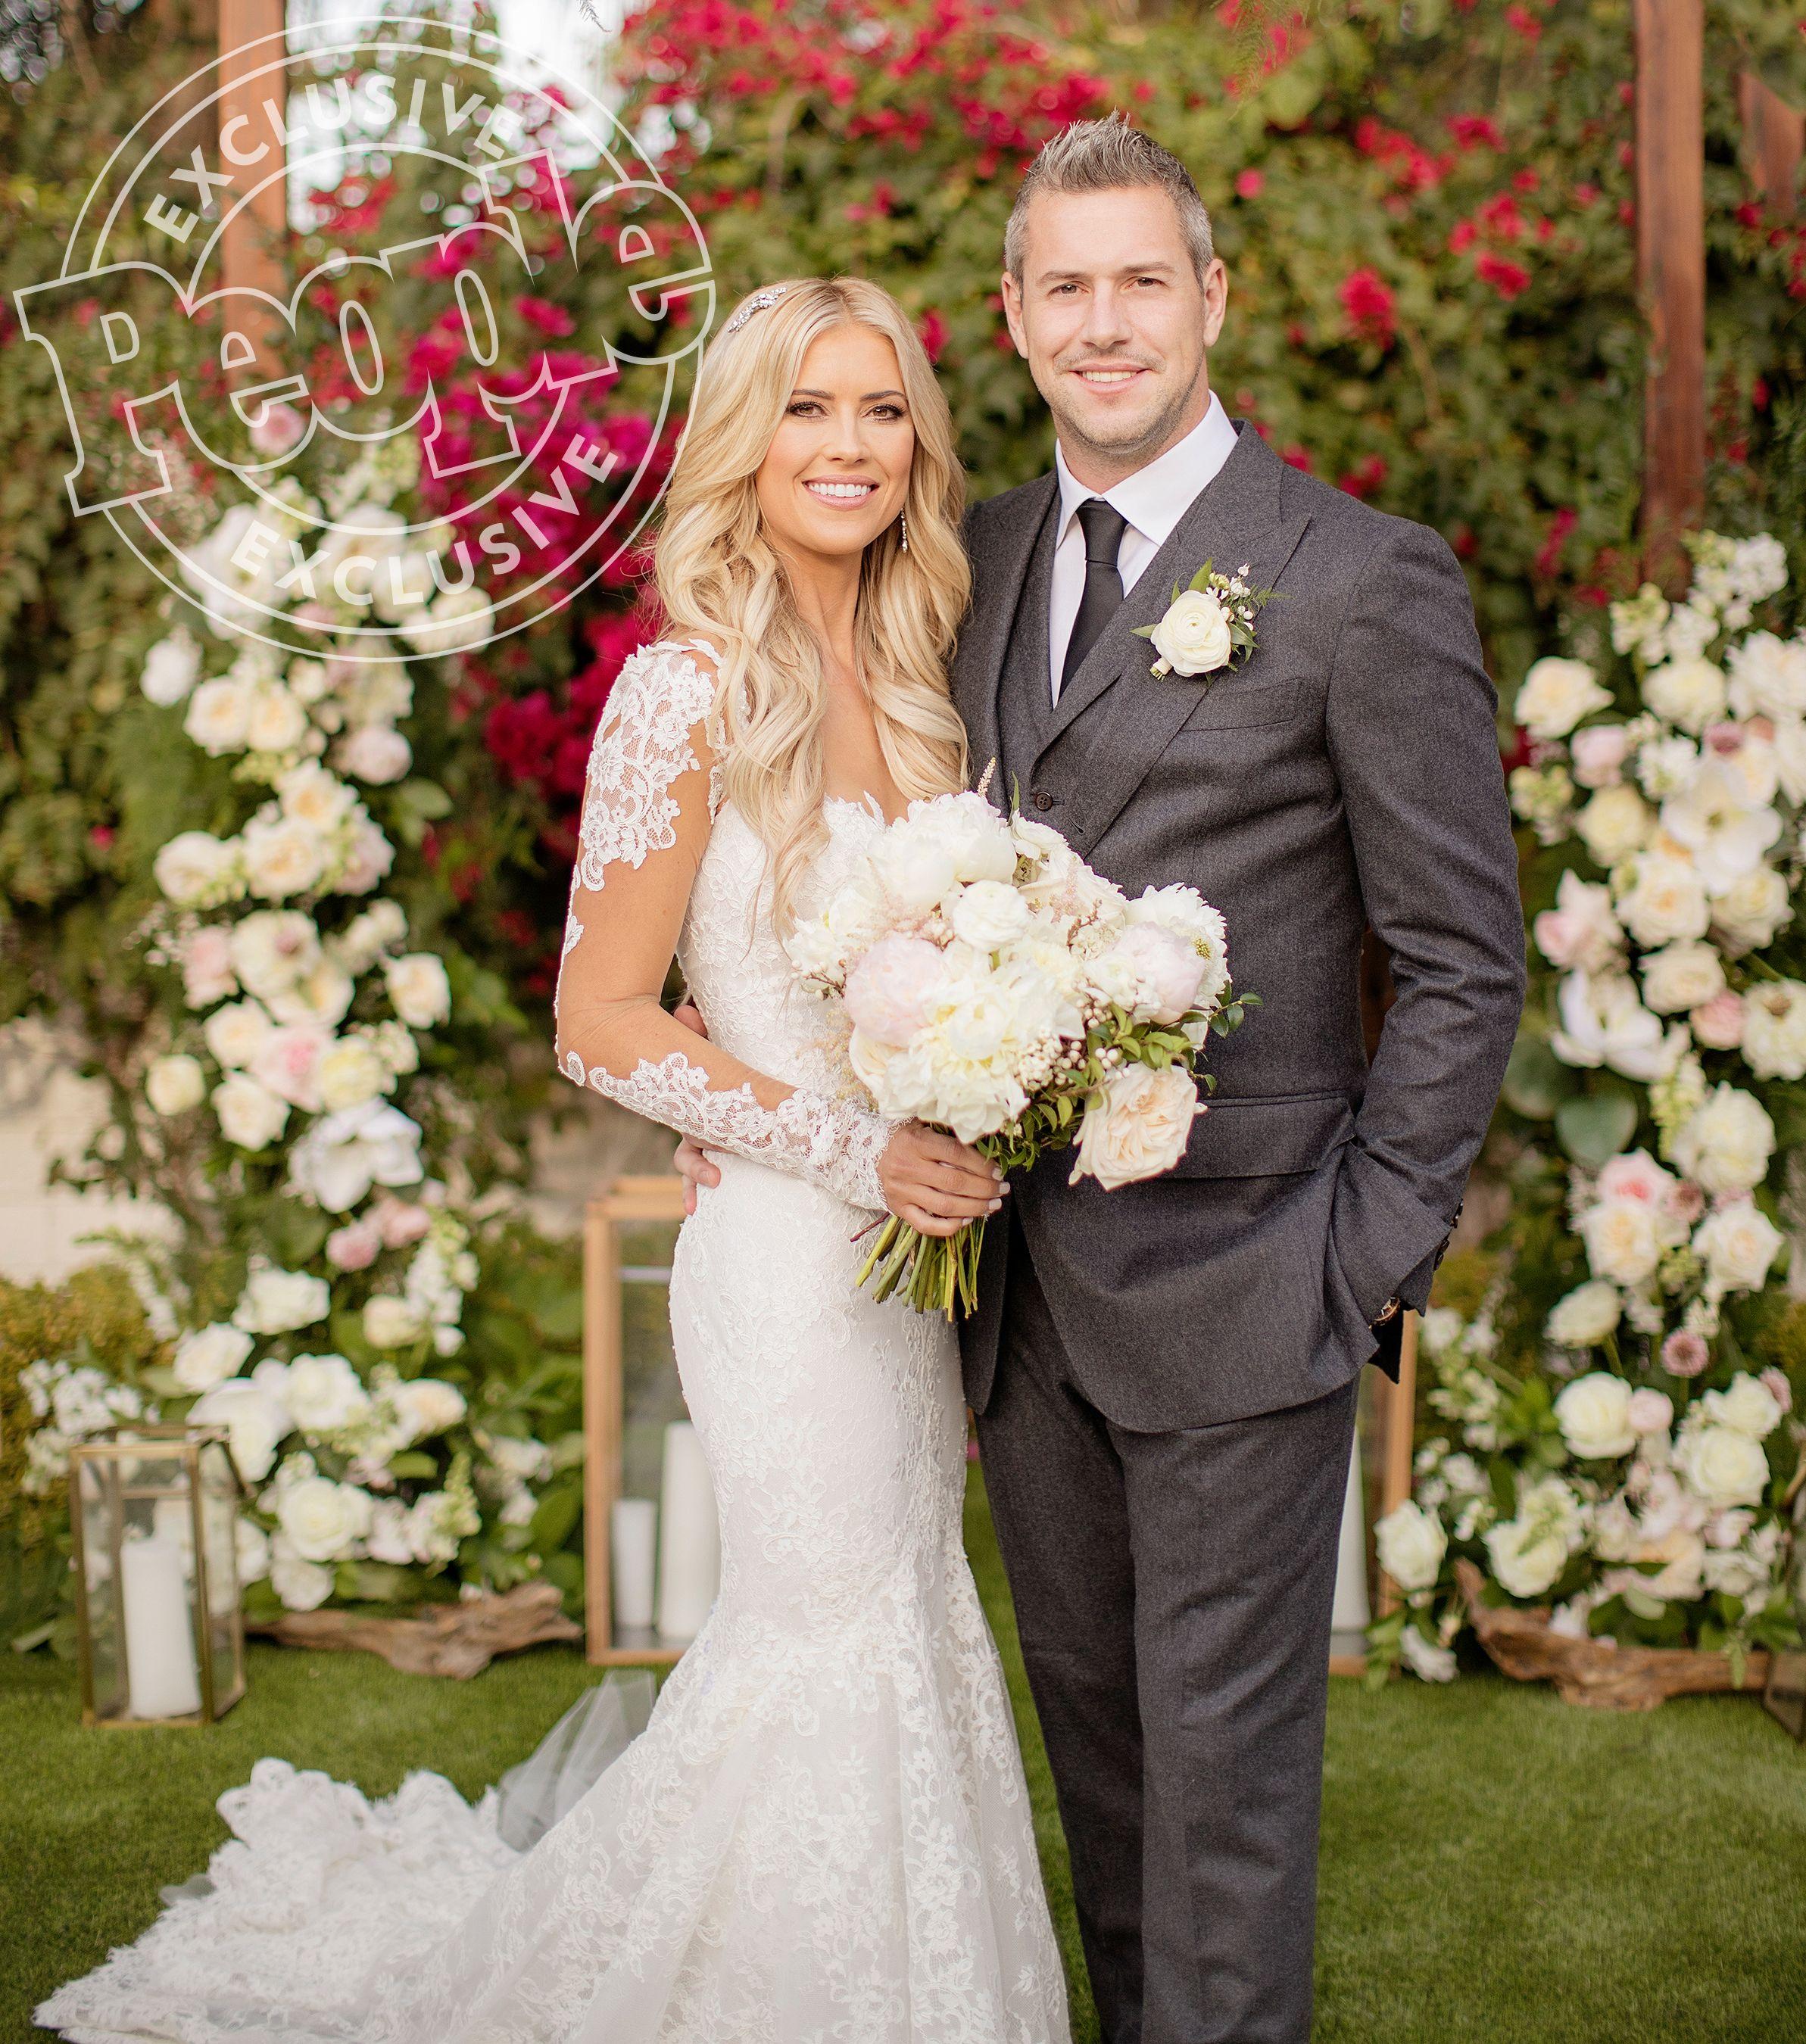 Christina El Moussa Is Married Inside Her Secret Winter Wonderland Wedding To Ant Anstead Wedding Dresses Celebrity Wedding Dresses Christina El Moussa